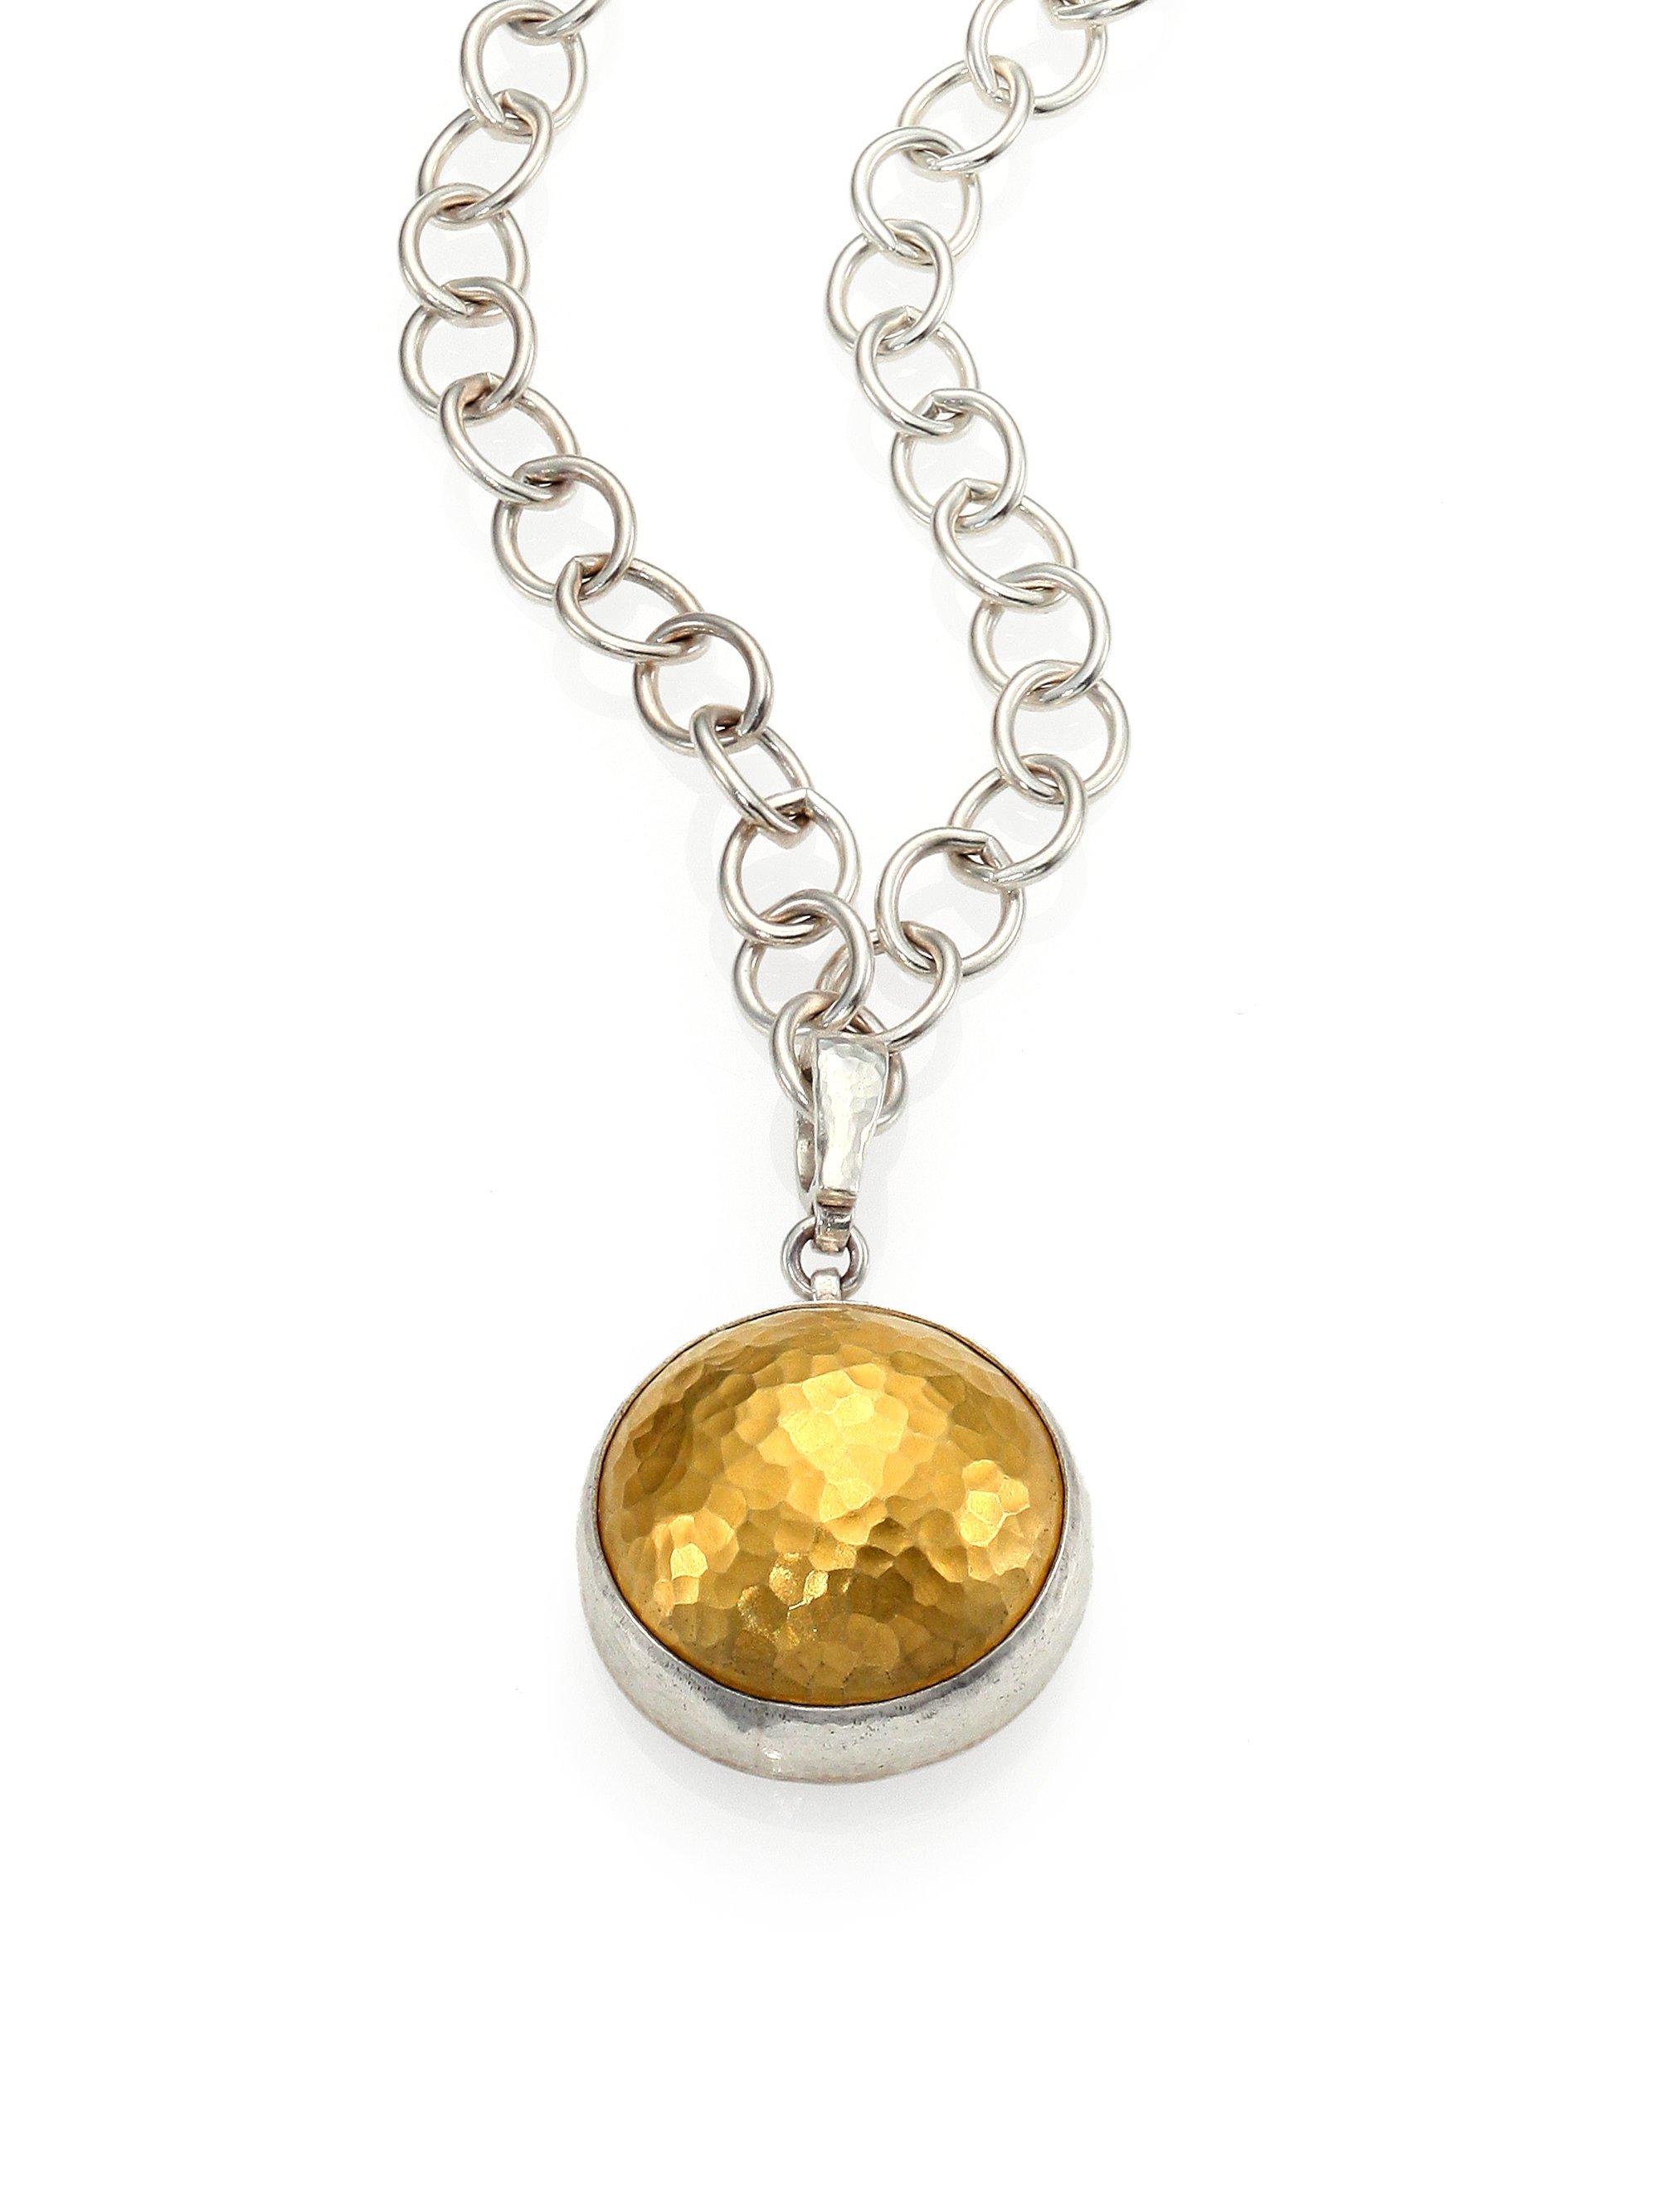 Amulet Jewelry Pendants Sothon: Gurhan Amulet Sterling 24k Yellow Gold Dome Pendant